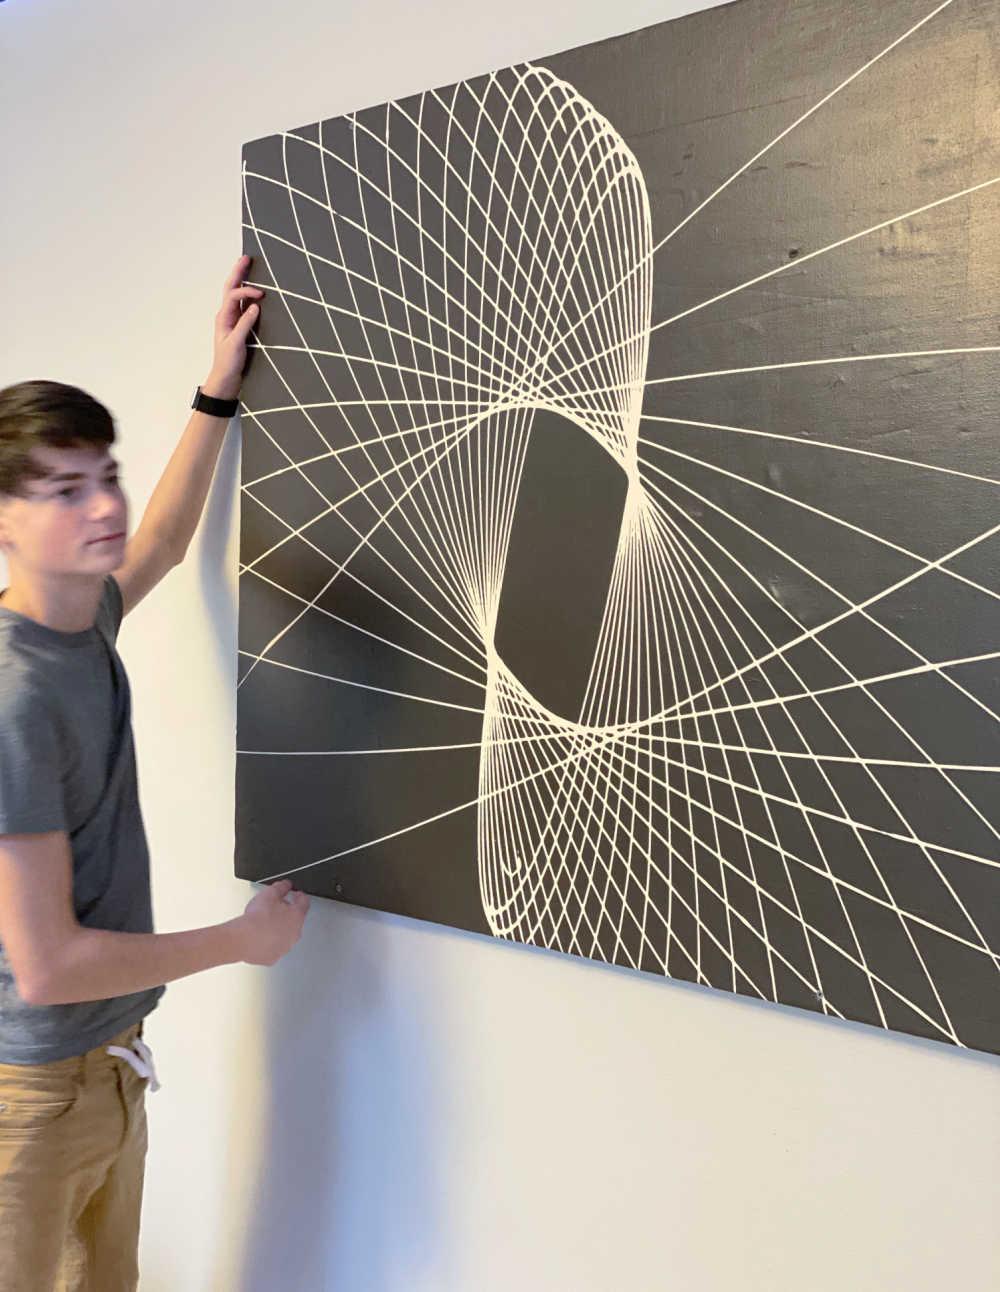 DIY pendulum wall wart